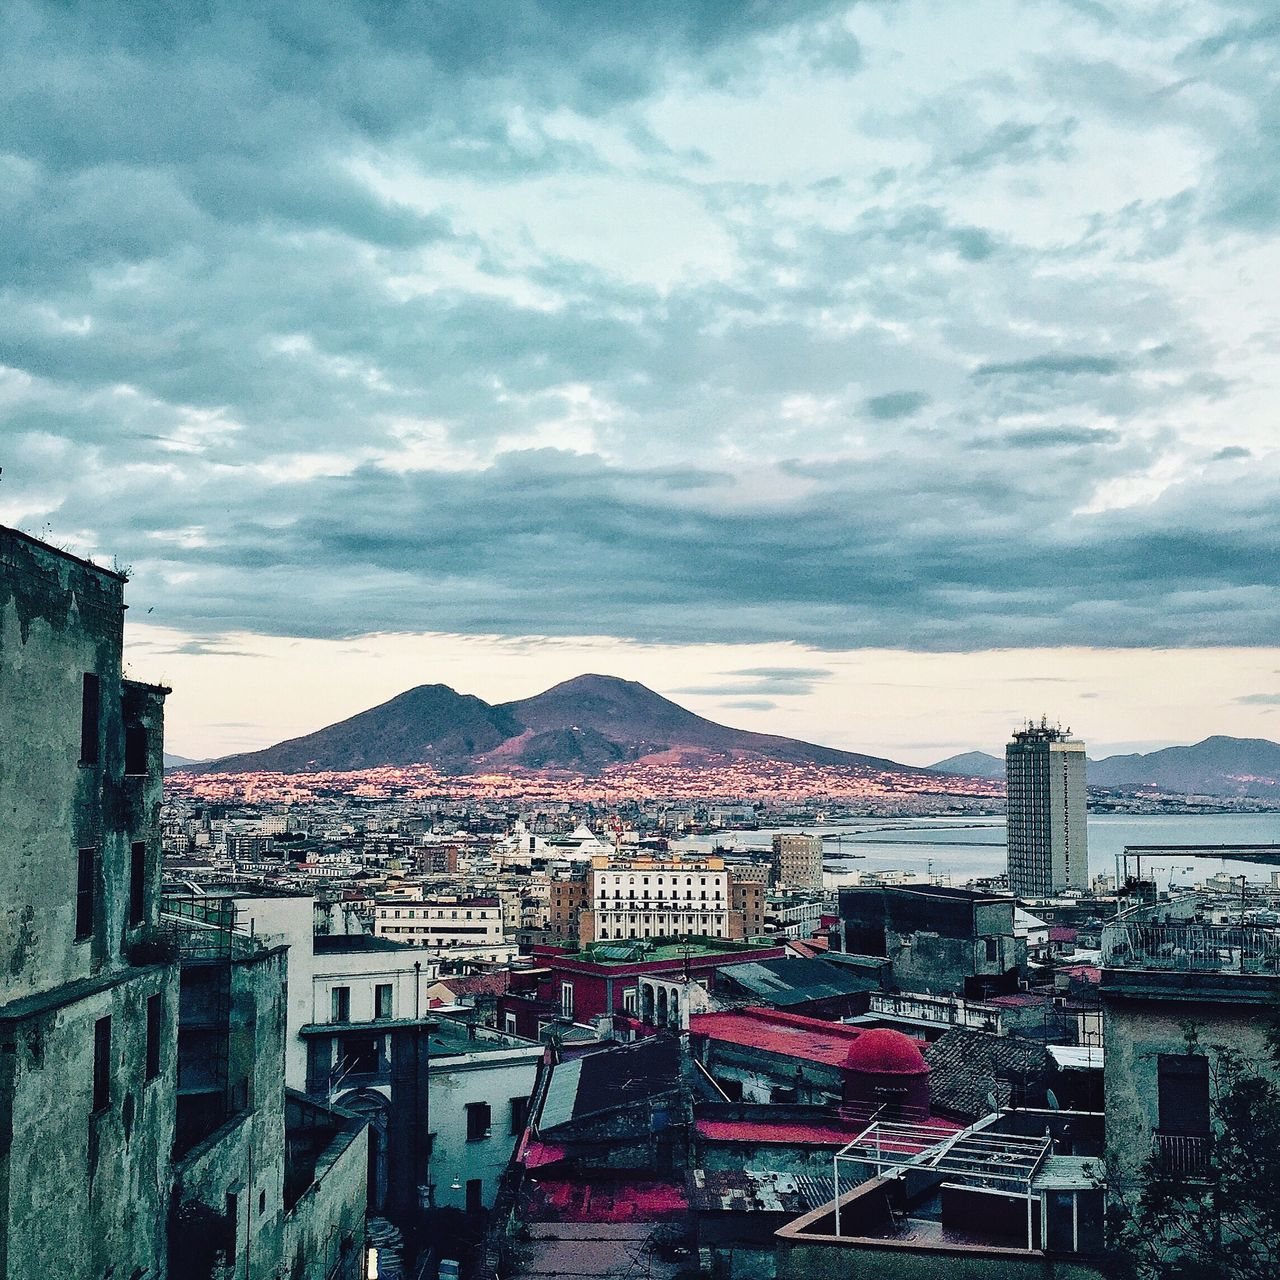 Napoli at Sunset